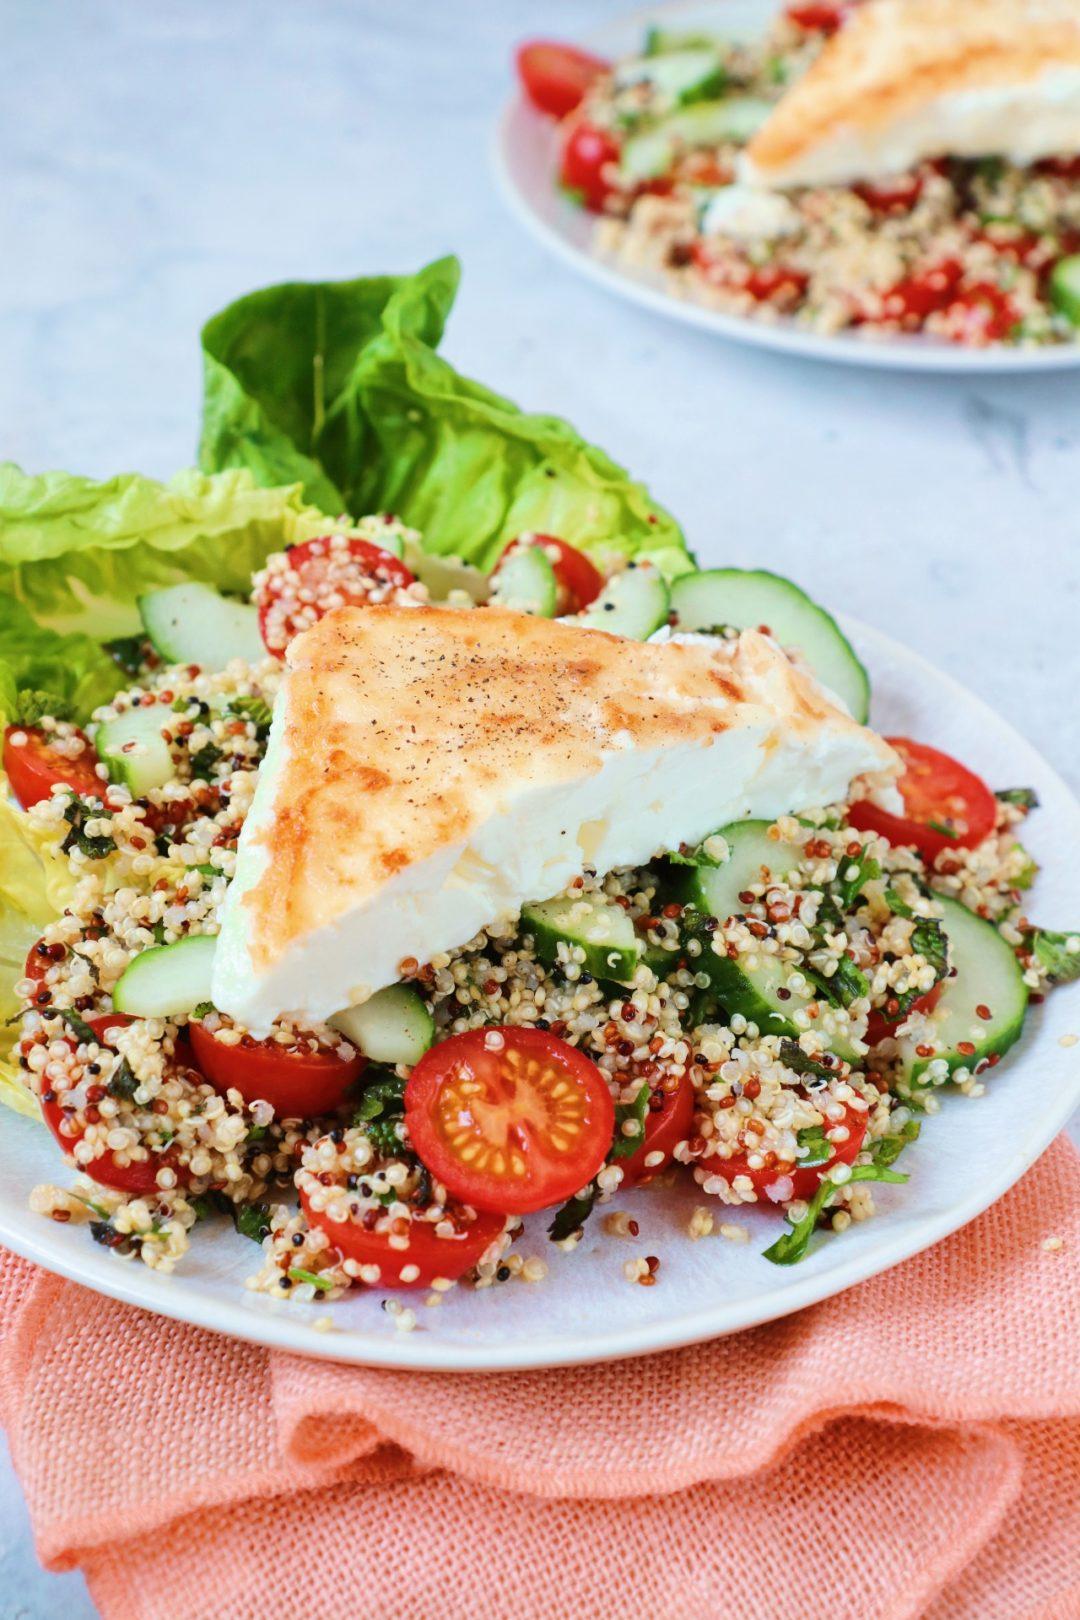 Quinoa salade met gebakken feta www.jaimyskitchen.nl